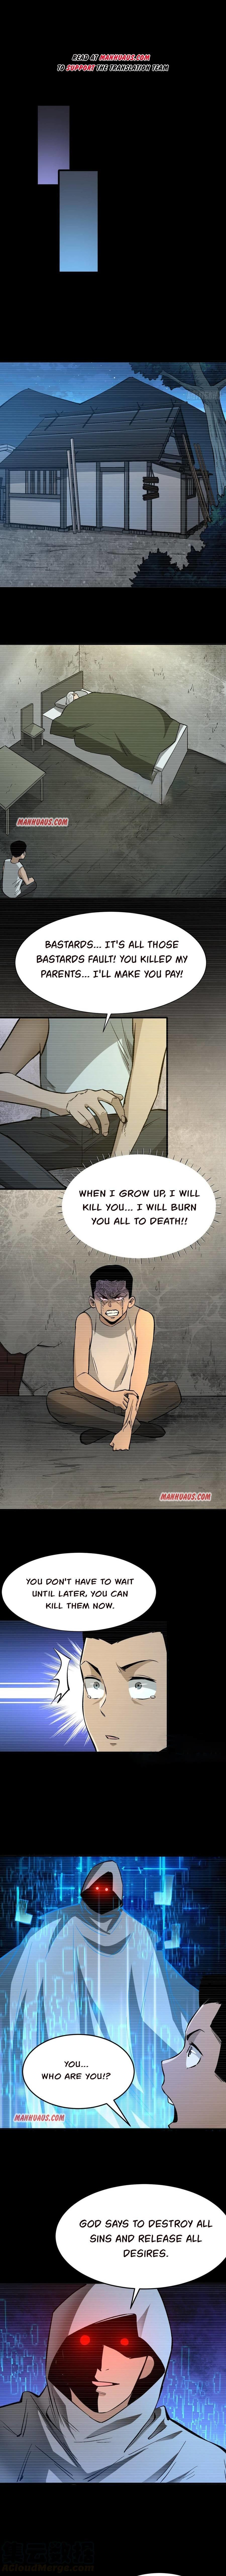 Back To Rule Again Chapter 142 page 2 - Mangakakalots.com